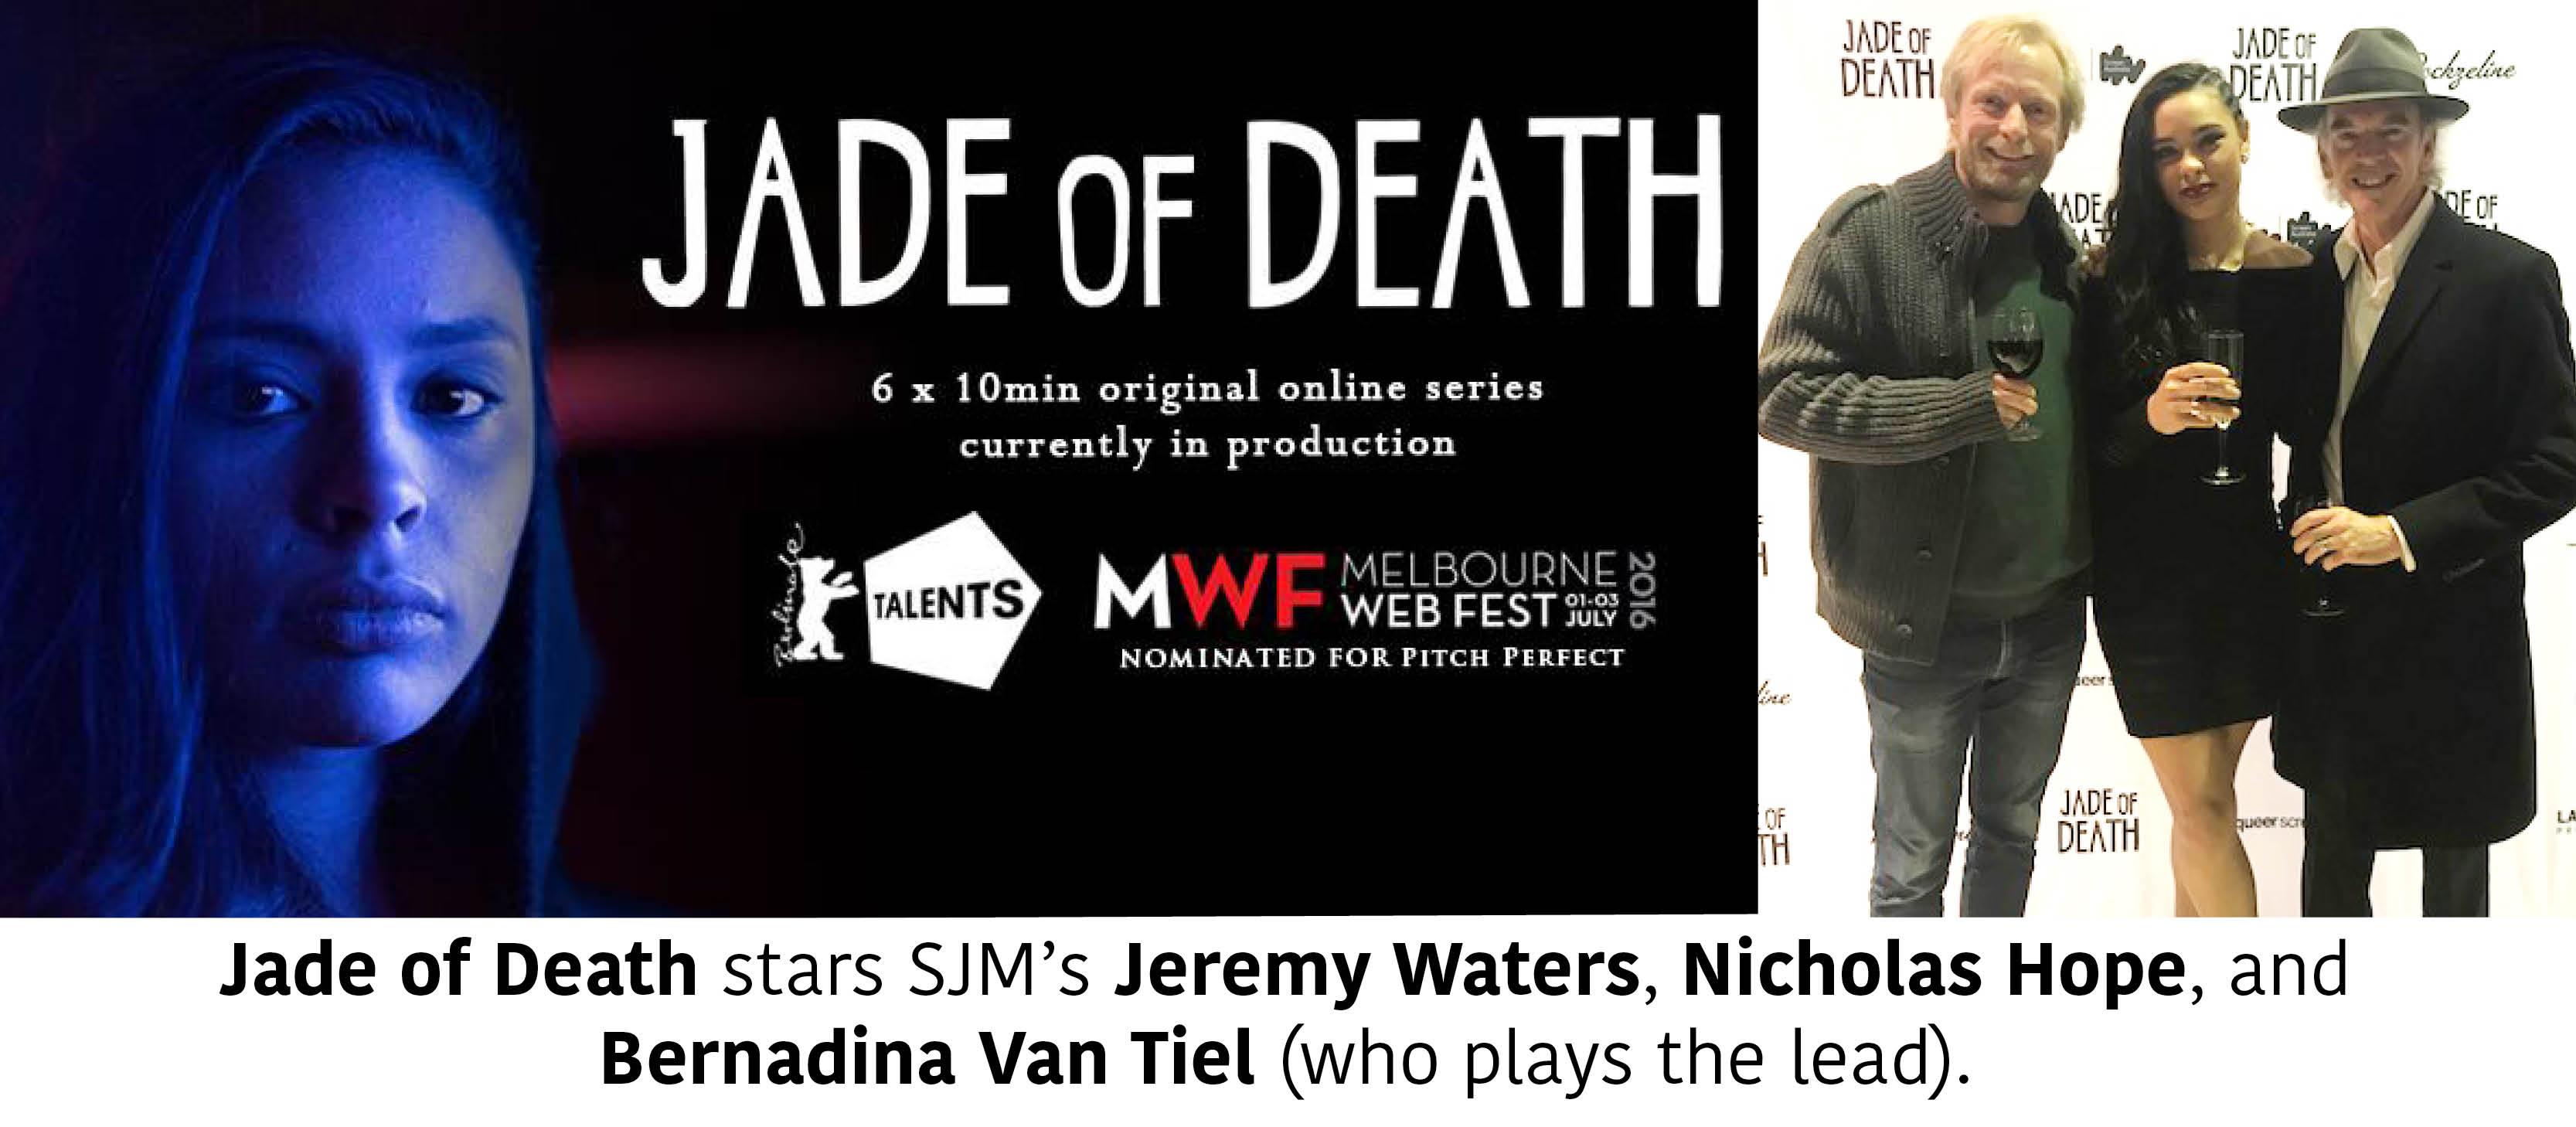 JADE OF DEATH premiere